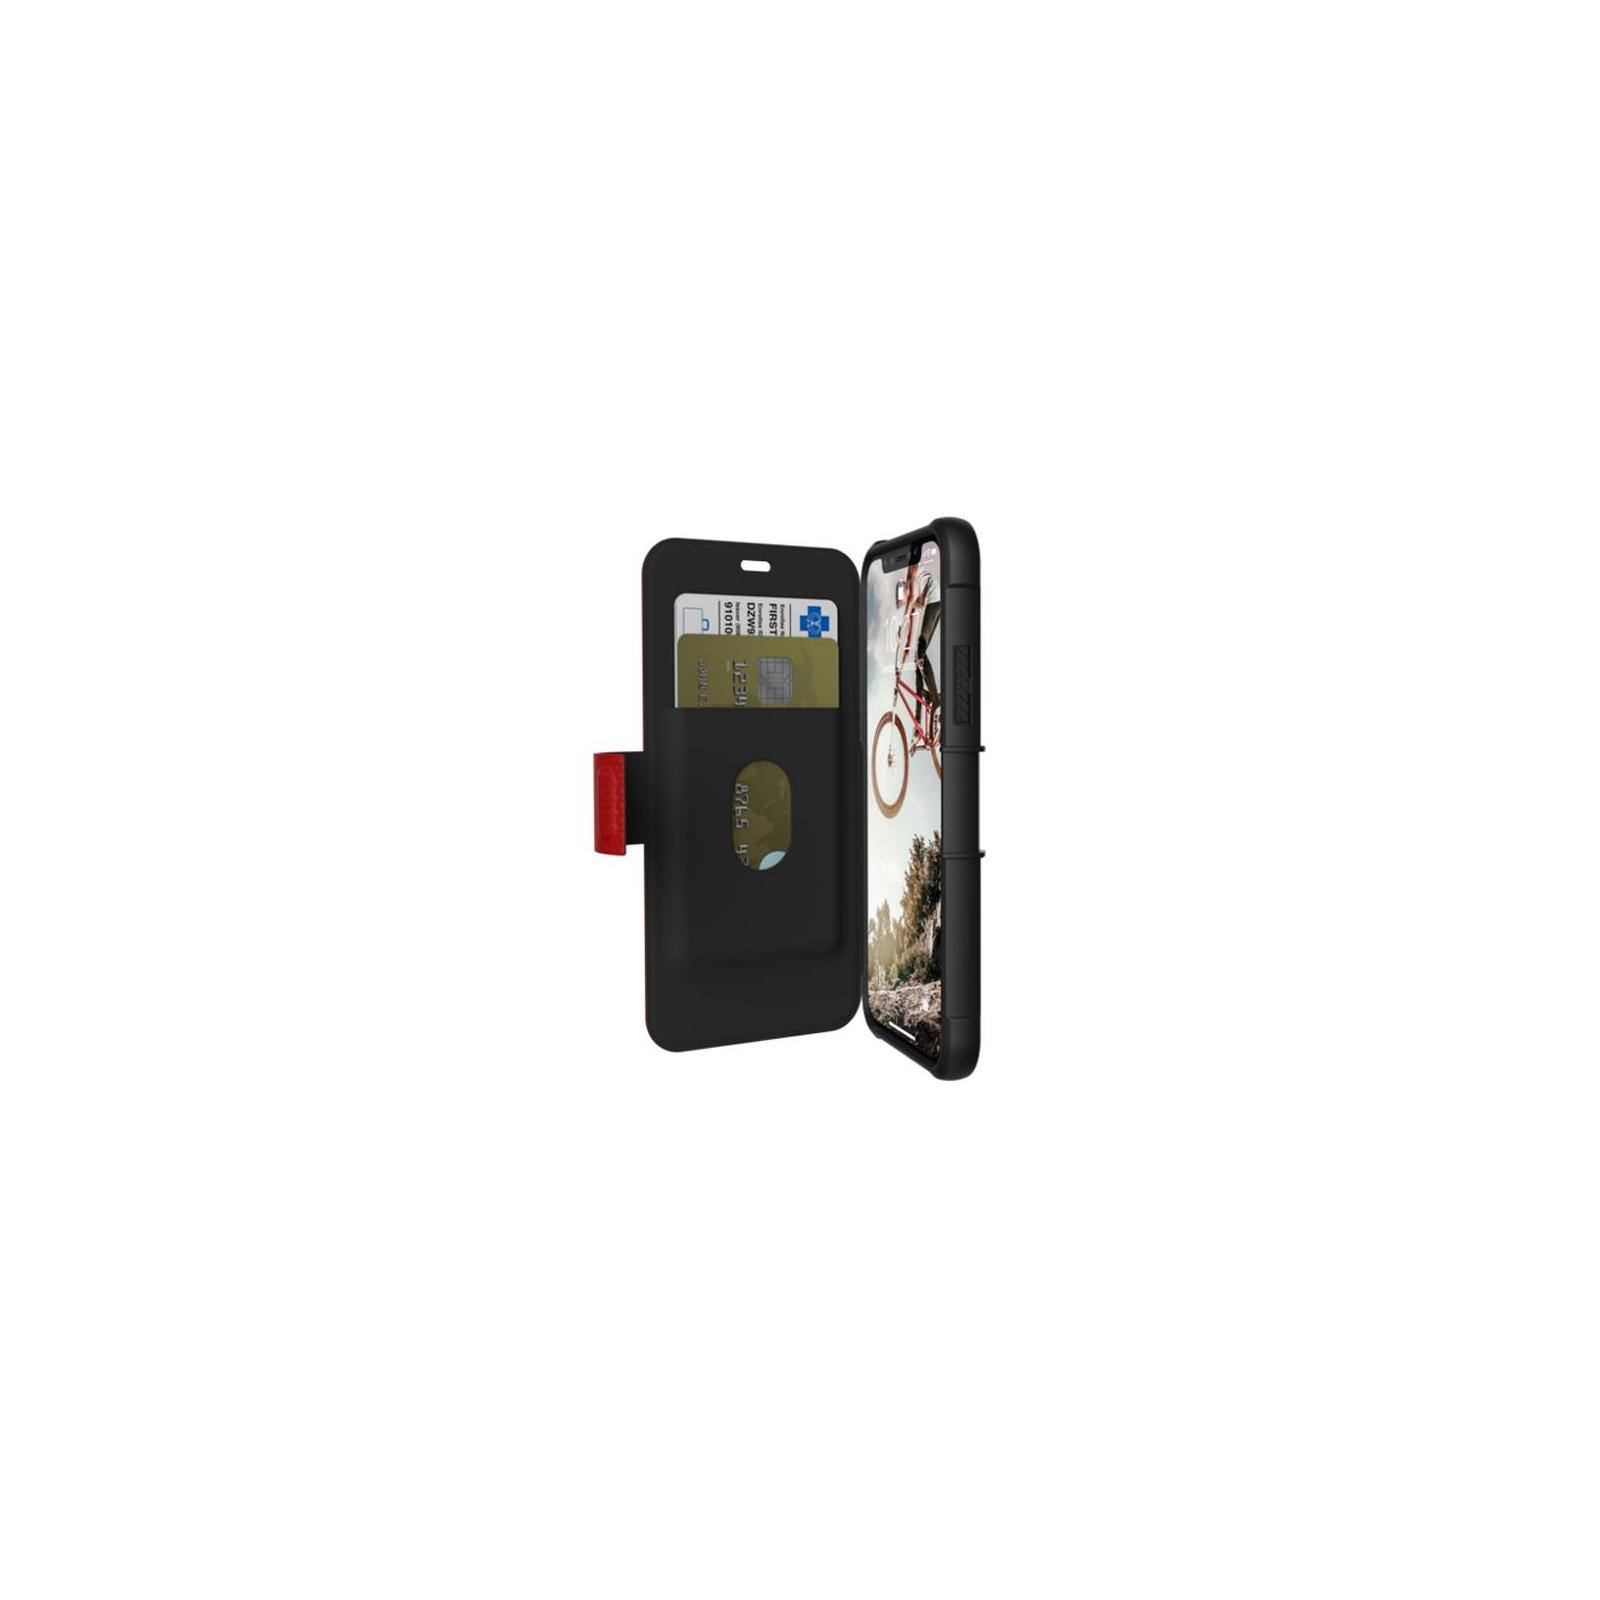 Чехол для моб. телефона Uag iPhone X Metropolis Black (IPH8-E-BL) изображение 5